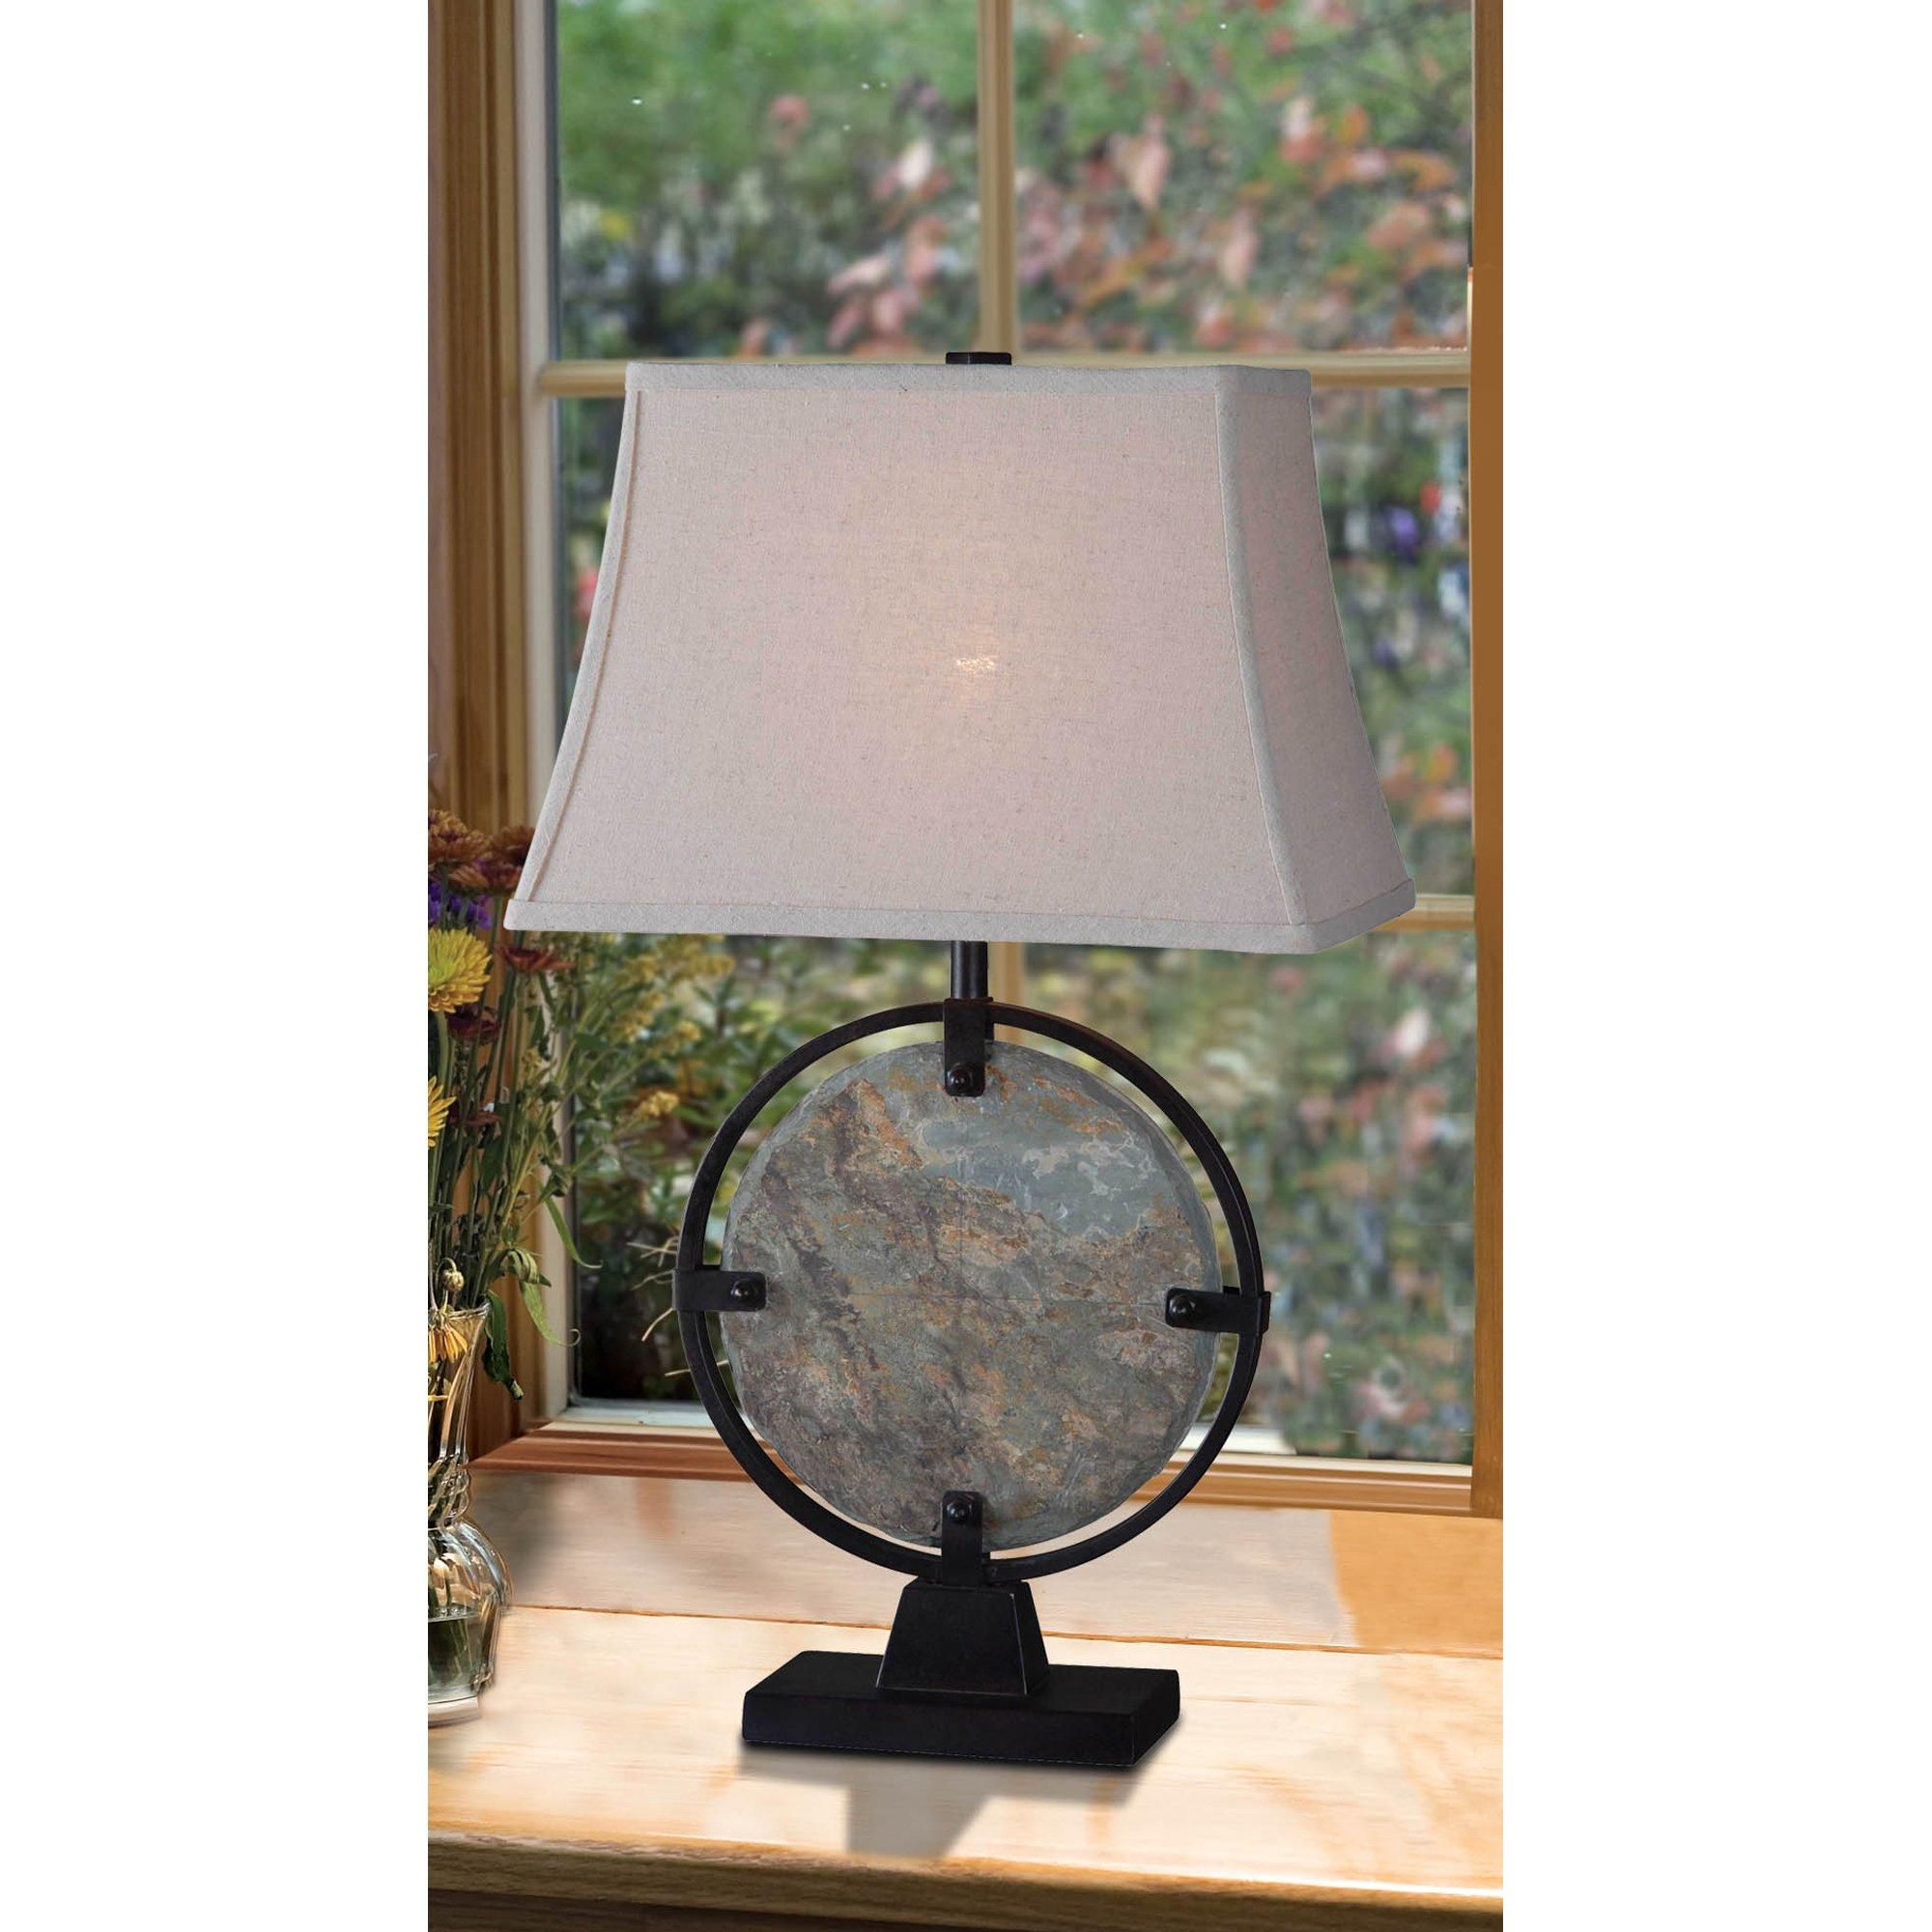 Kenroy Home 32226SL Suspension Table Lamp, Natural Slate by Kenroy Home (Image #2)